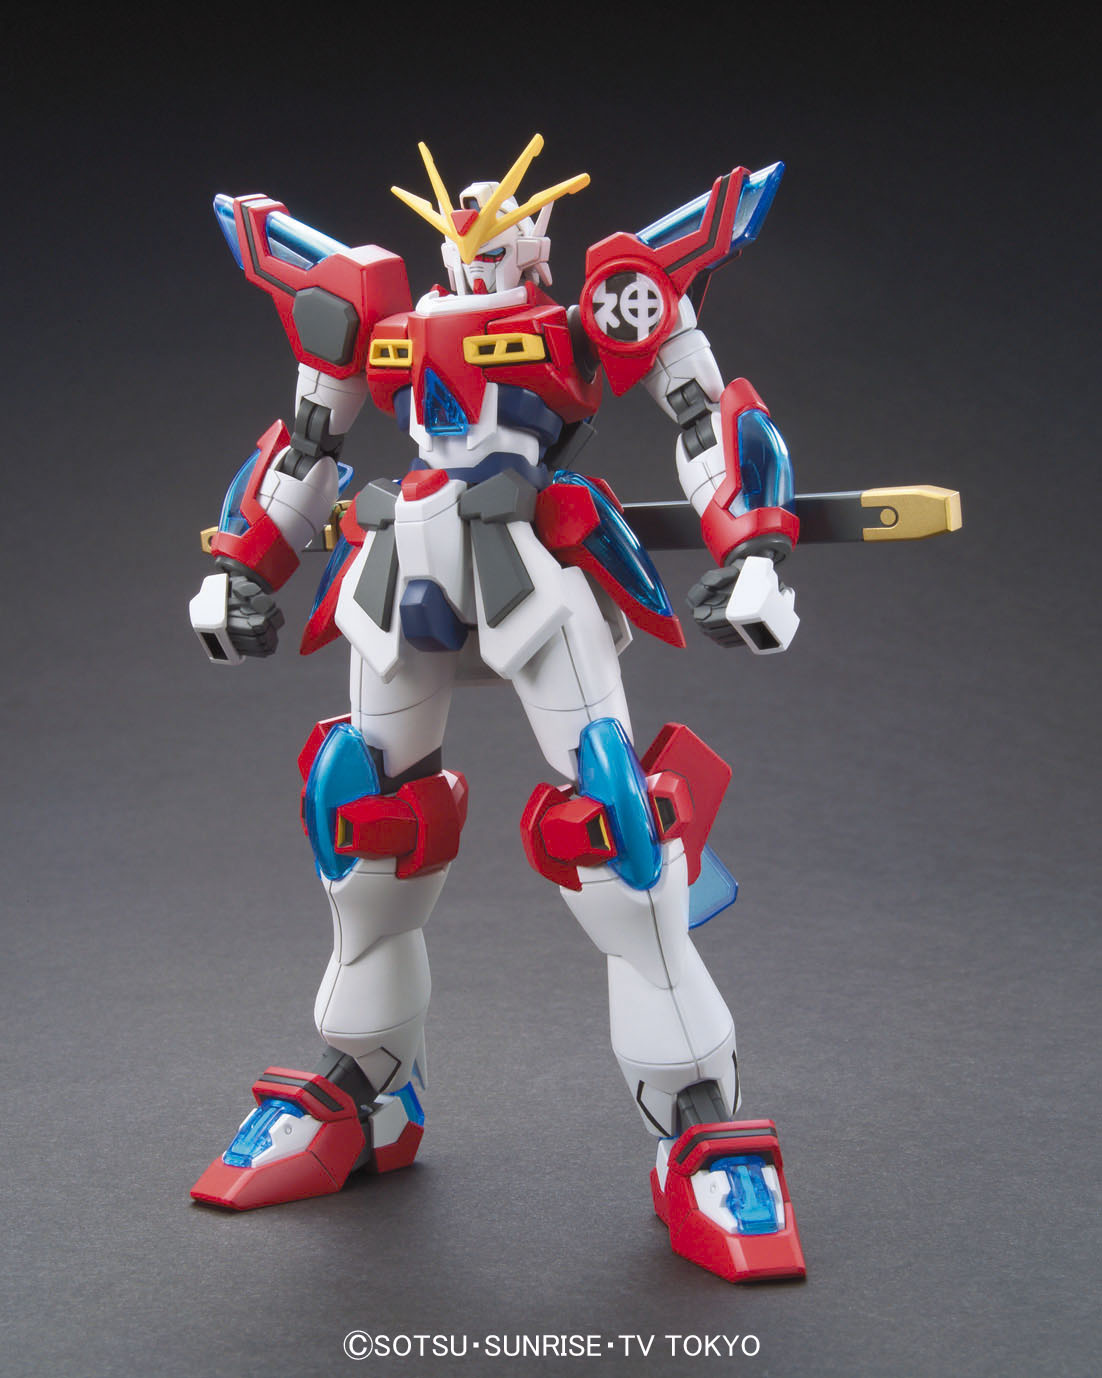 HGBF 1/144 KMK-B01 カミキバーニングガンダム [Kamiki Burning Gundam] 0201304 5057721